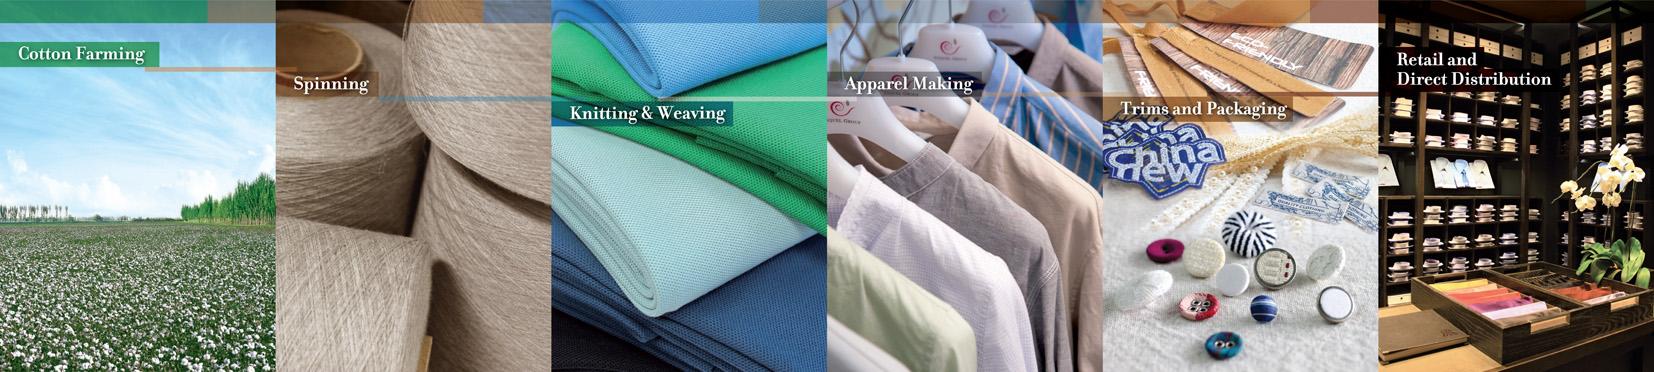 Esquel Garment Manufacturing (VN)